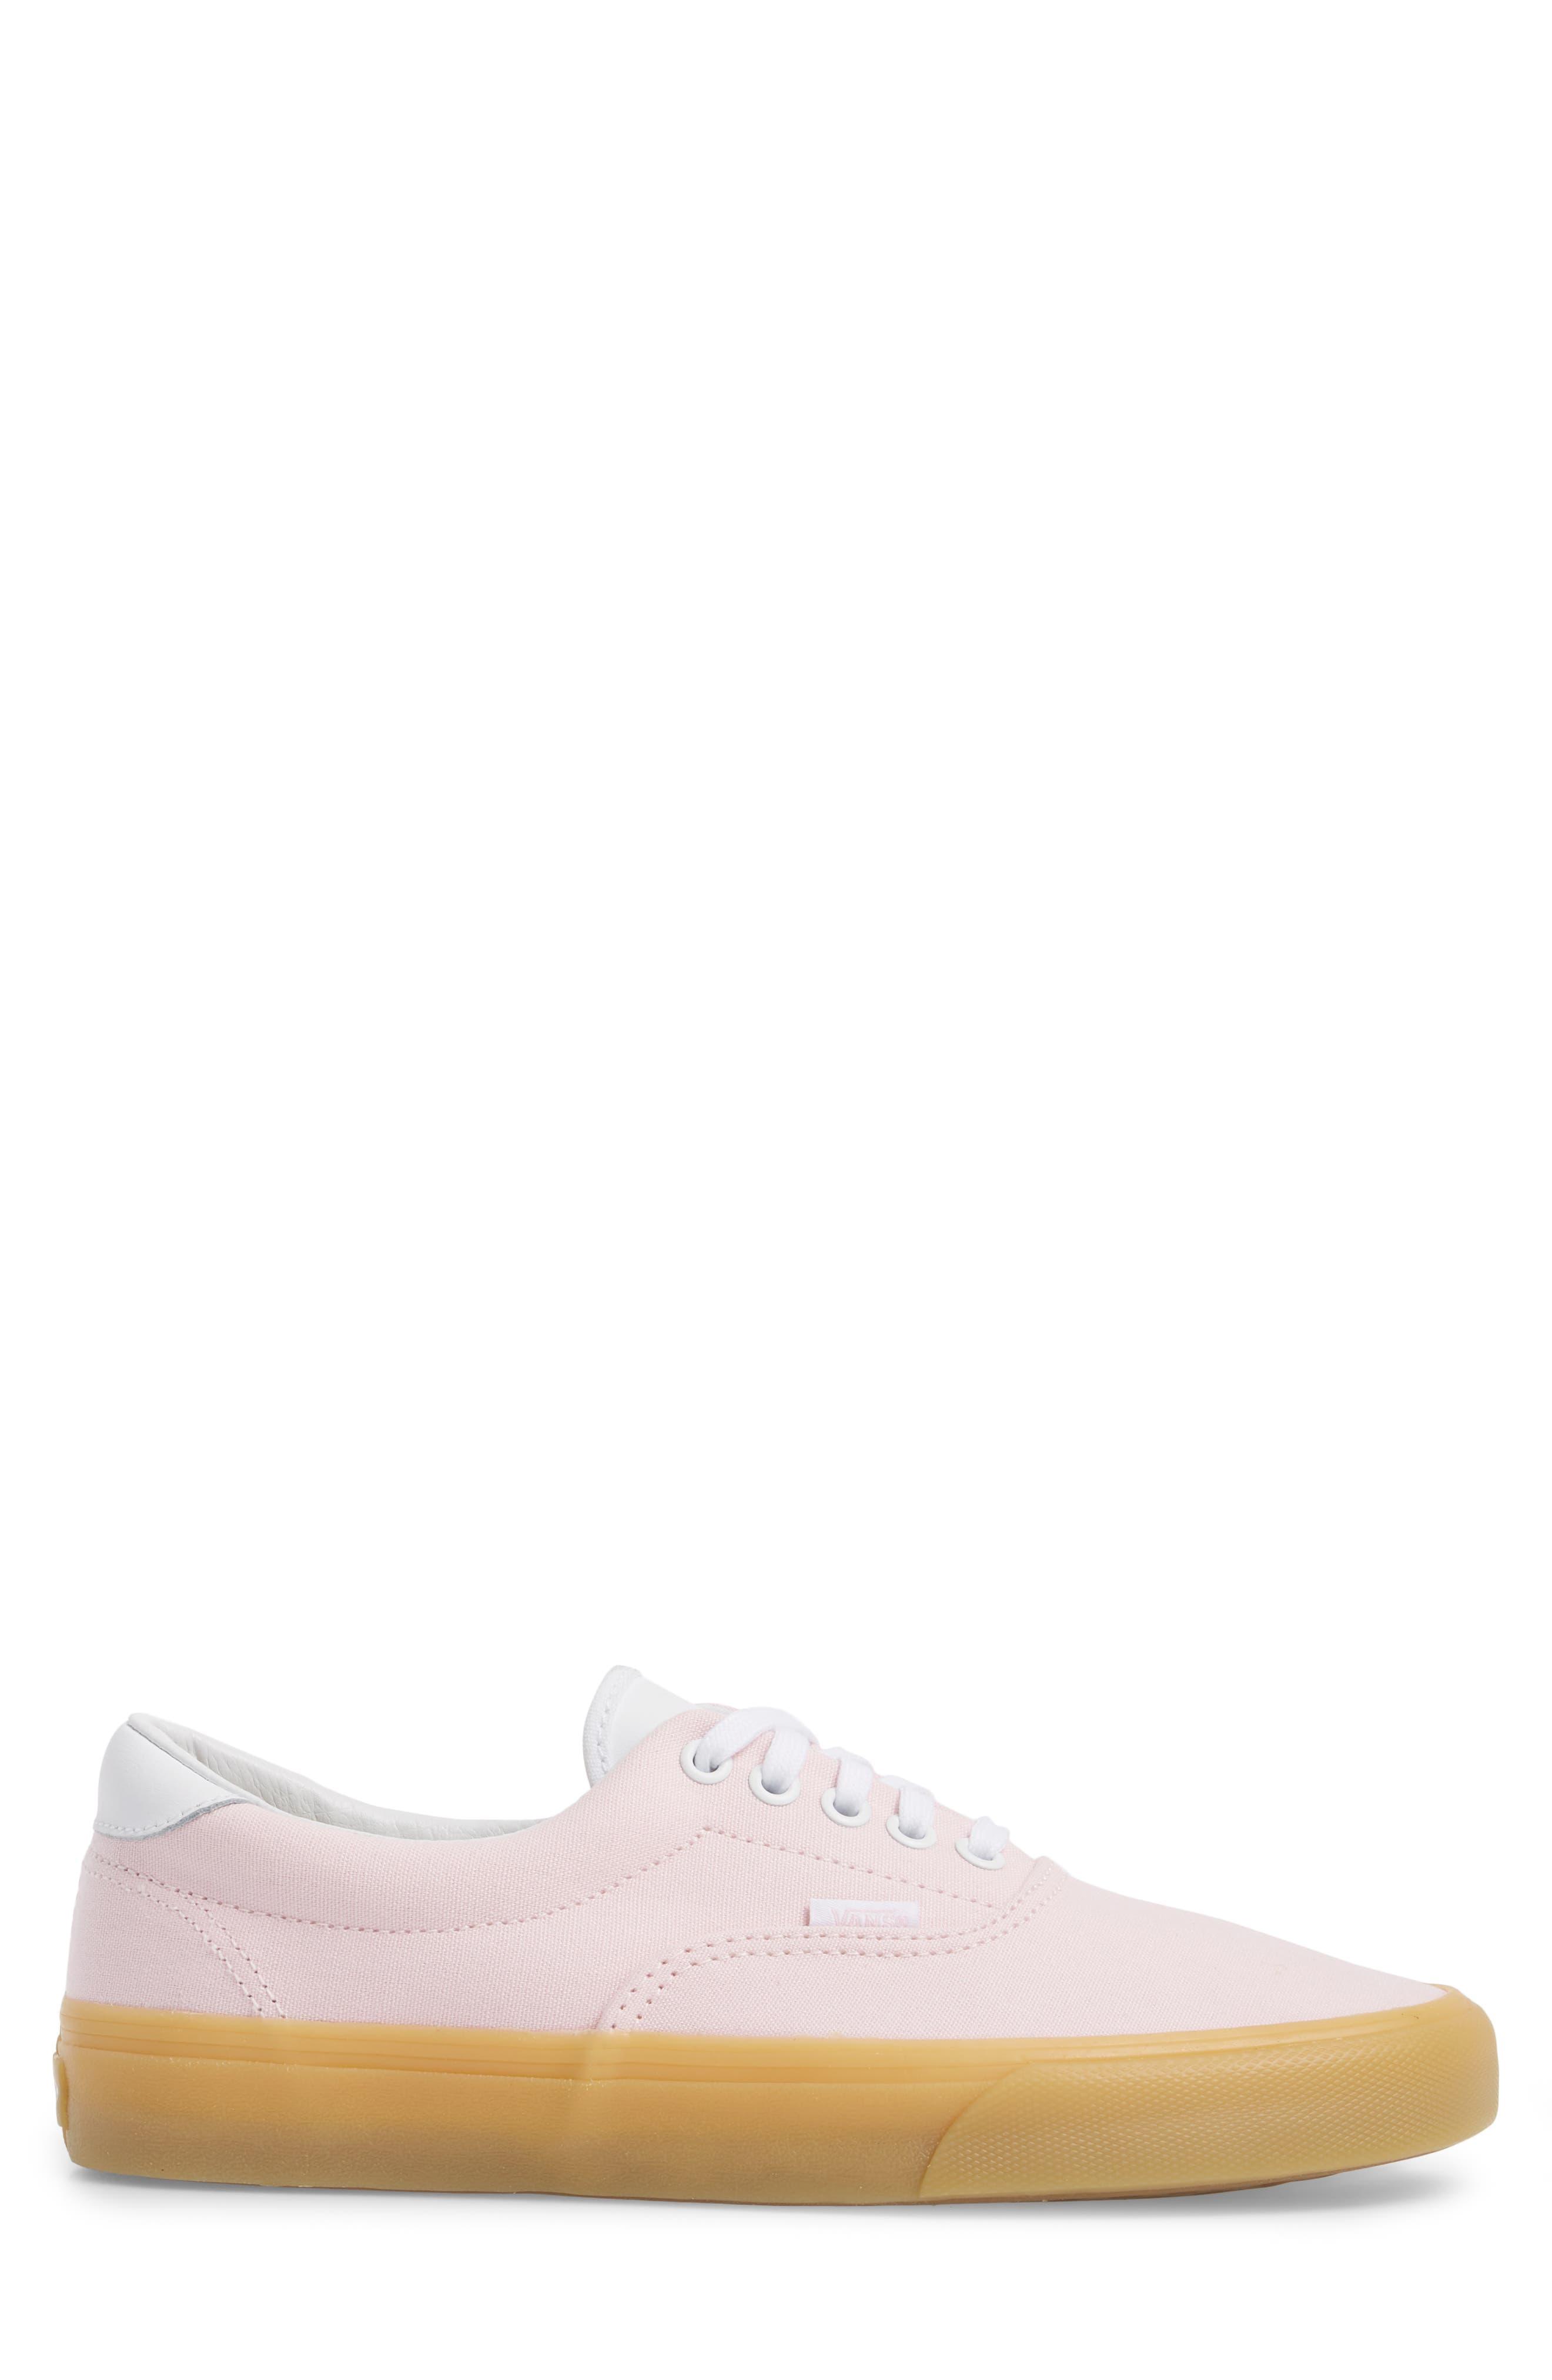 Era 59 Gum Sneaker,                             Alternate thumbnail 3, color,                             Chalk Pink